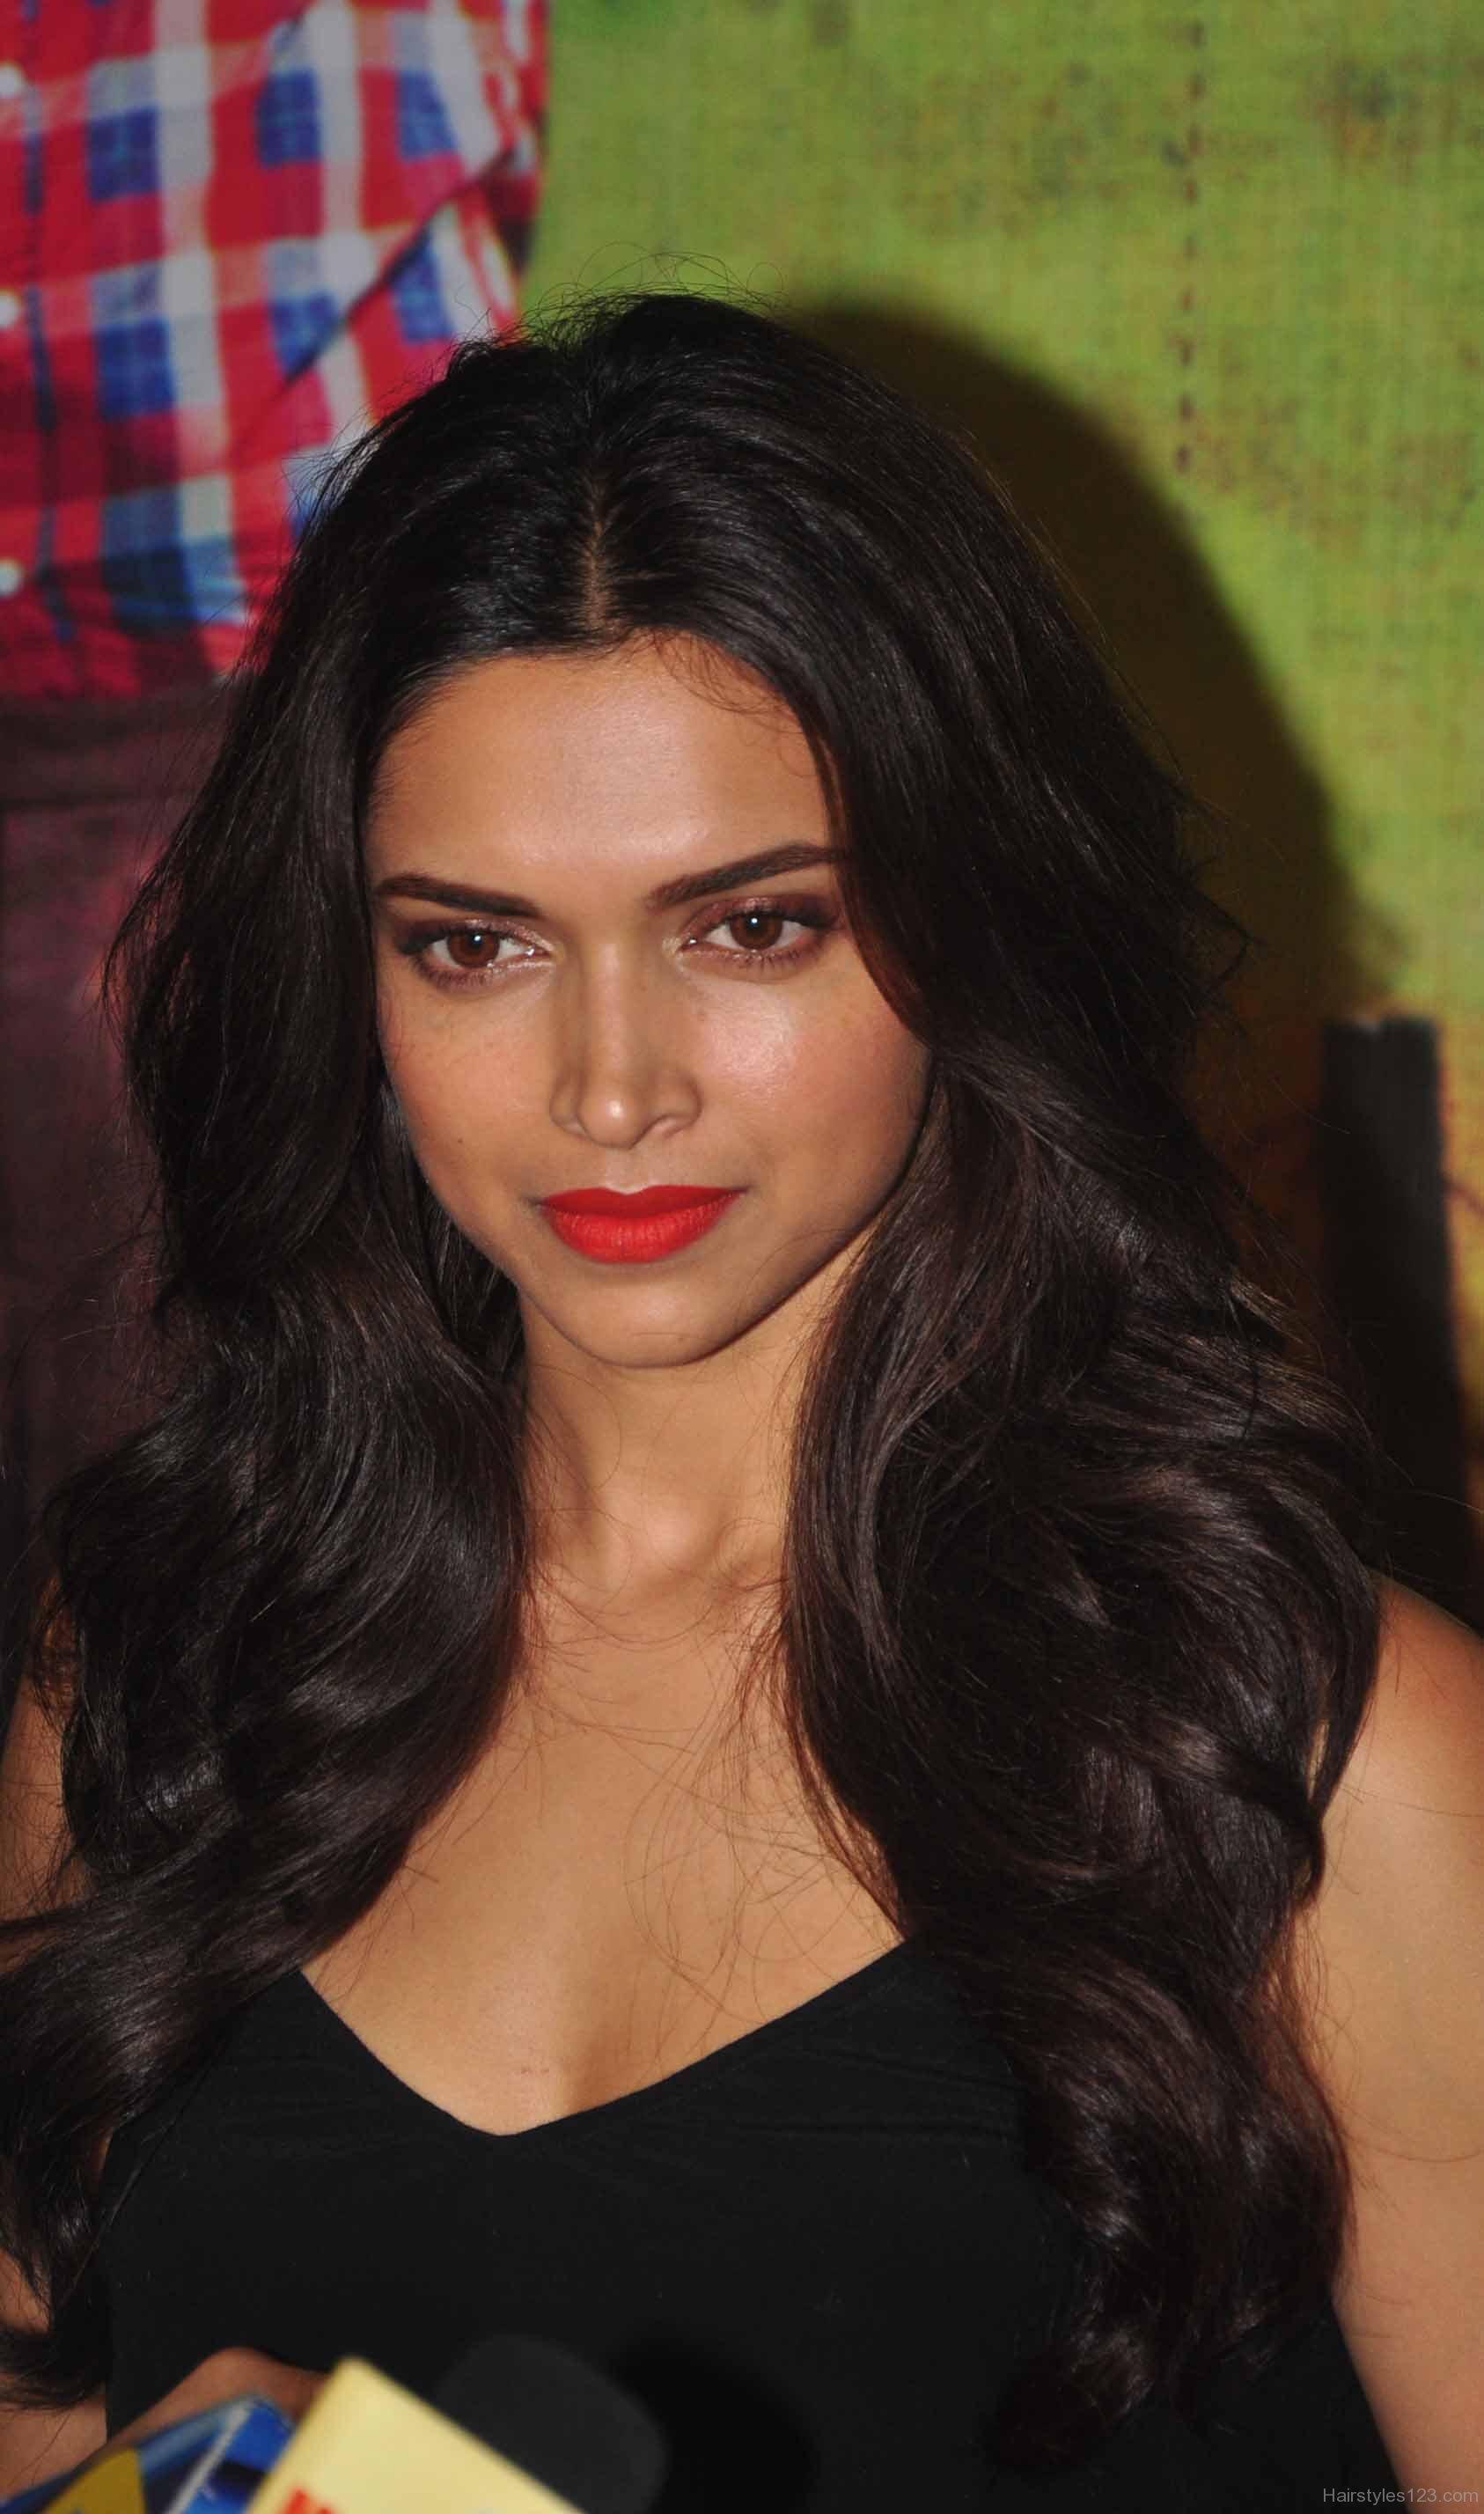 15 Amazing Deepika Padukone Hairstyles - FashionPro